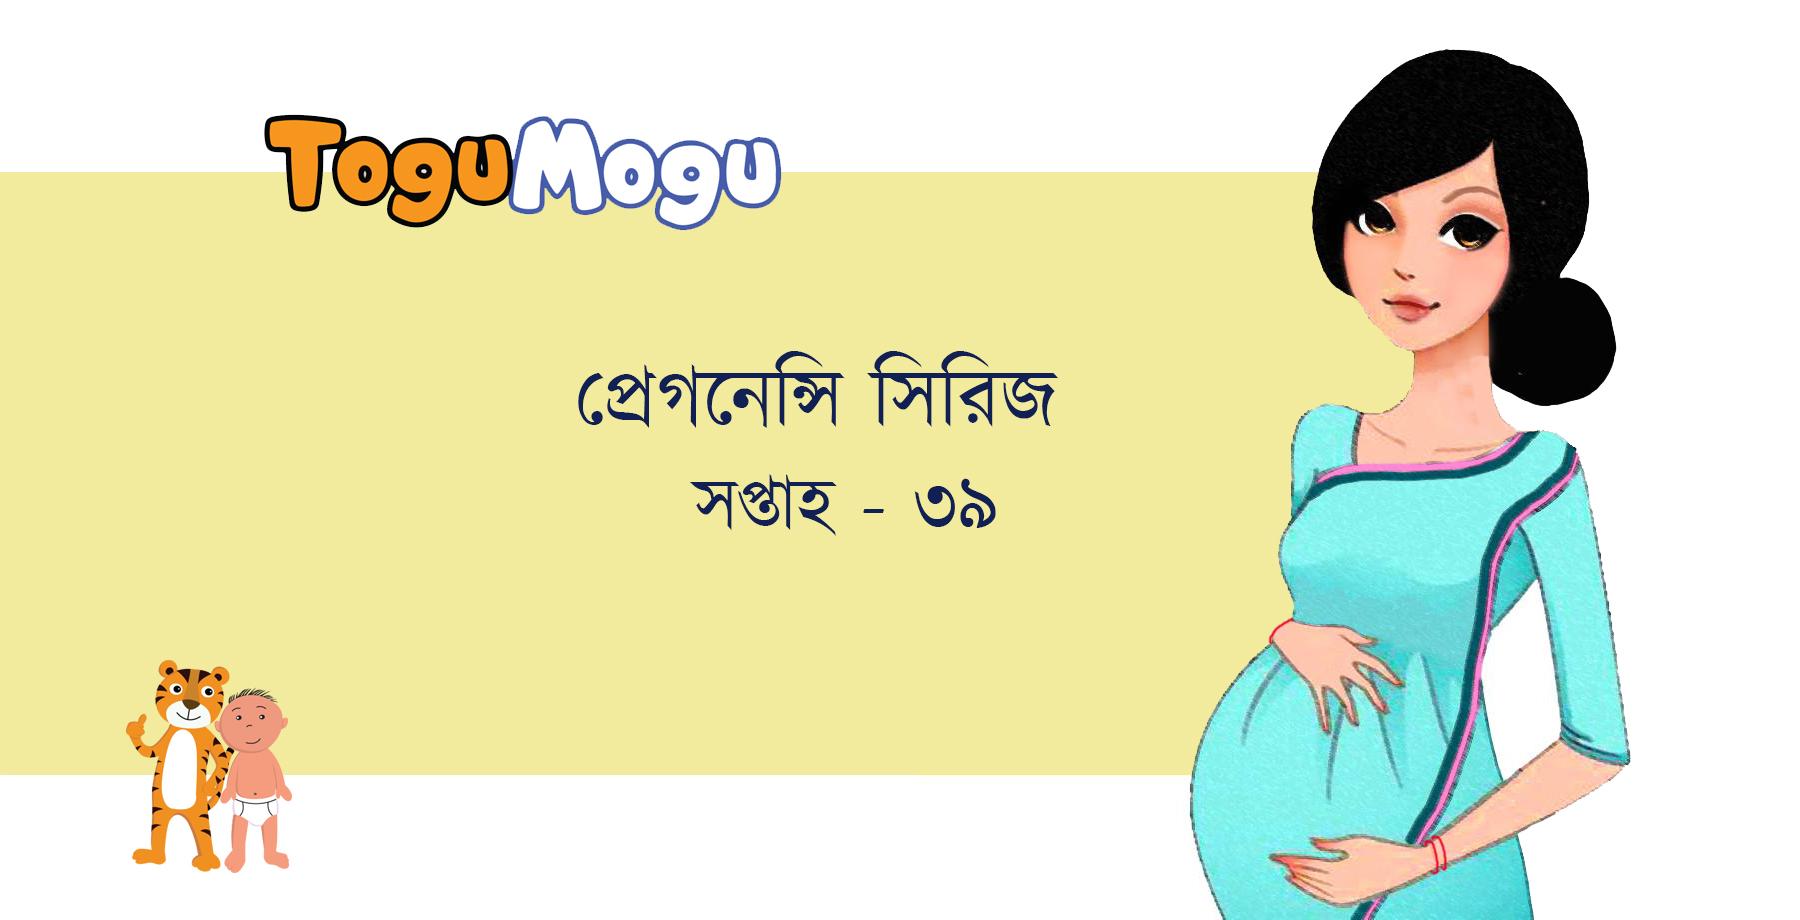 ToguMogu Pregnancy Series: সপ্তাহ ৩৯